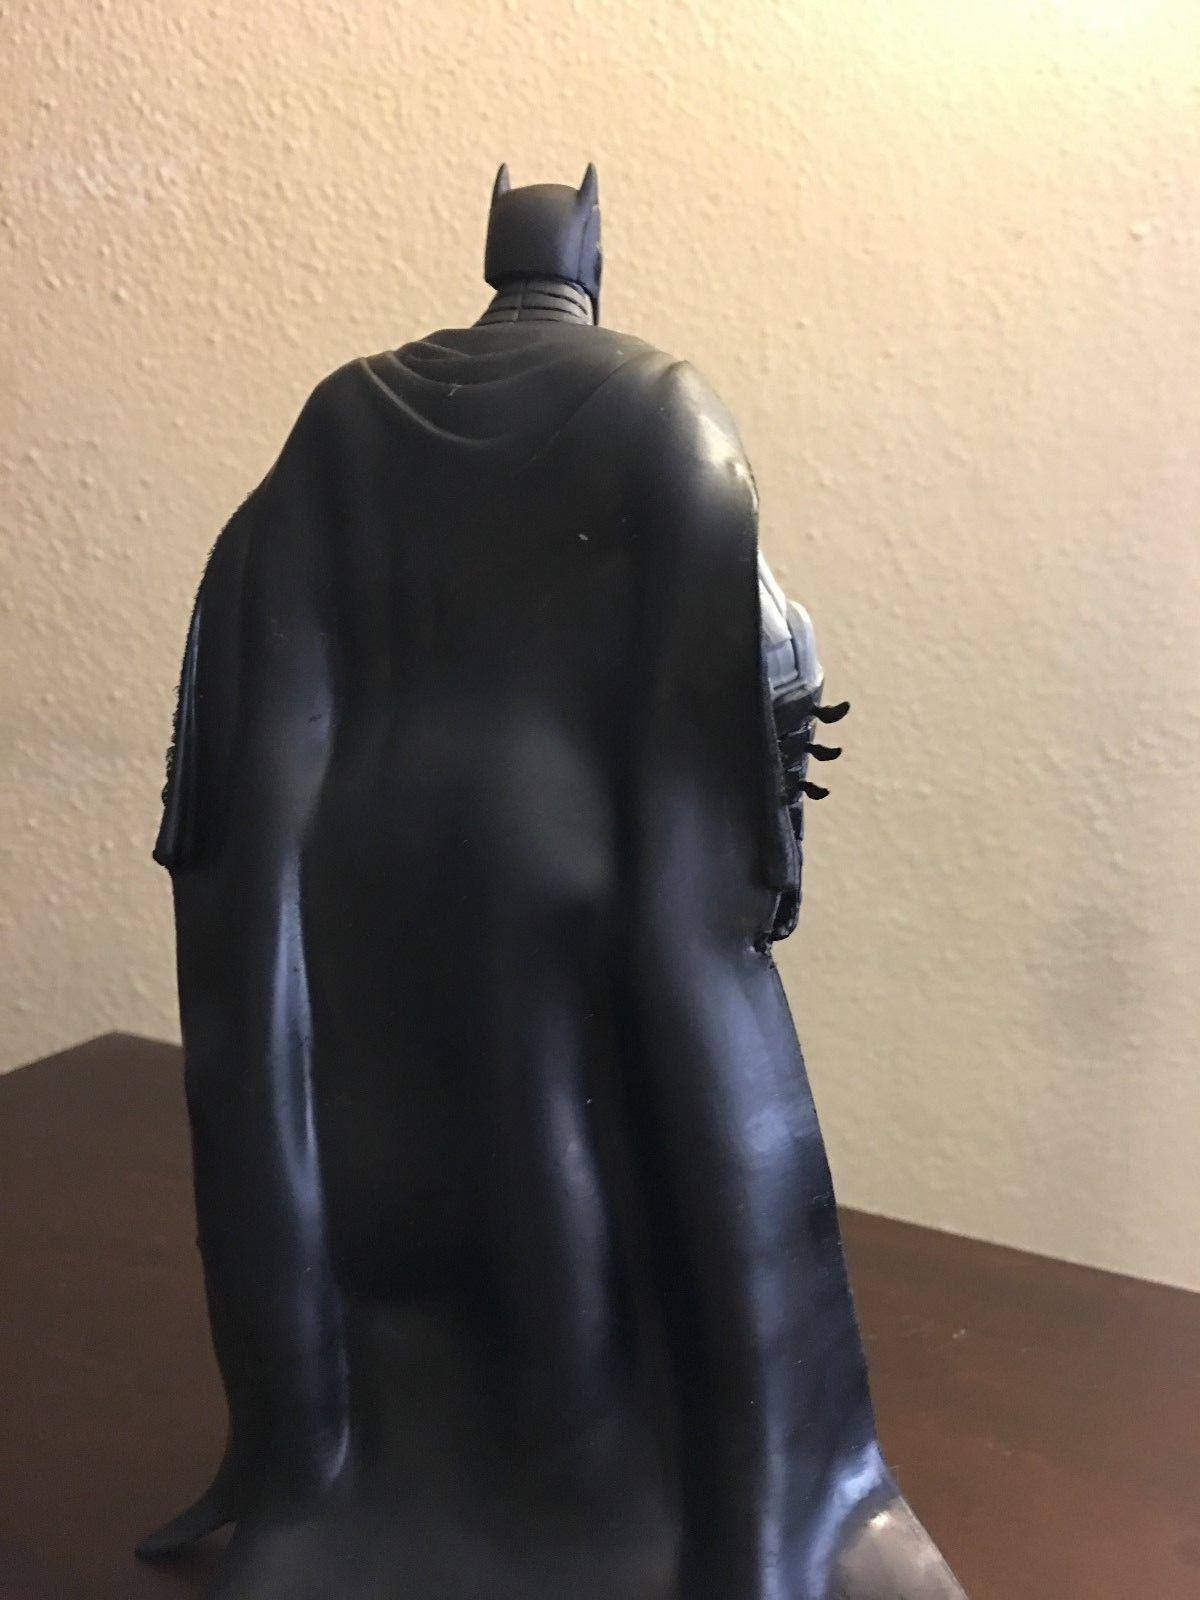 Batman dc comics action figure